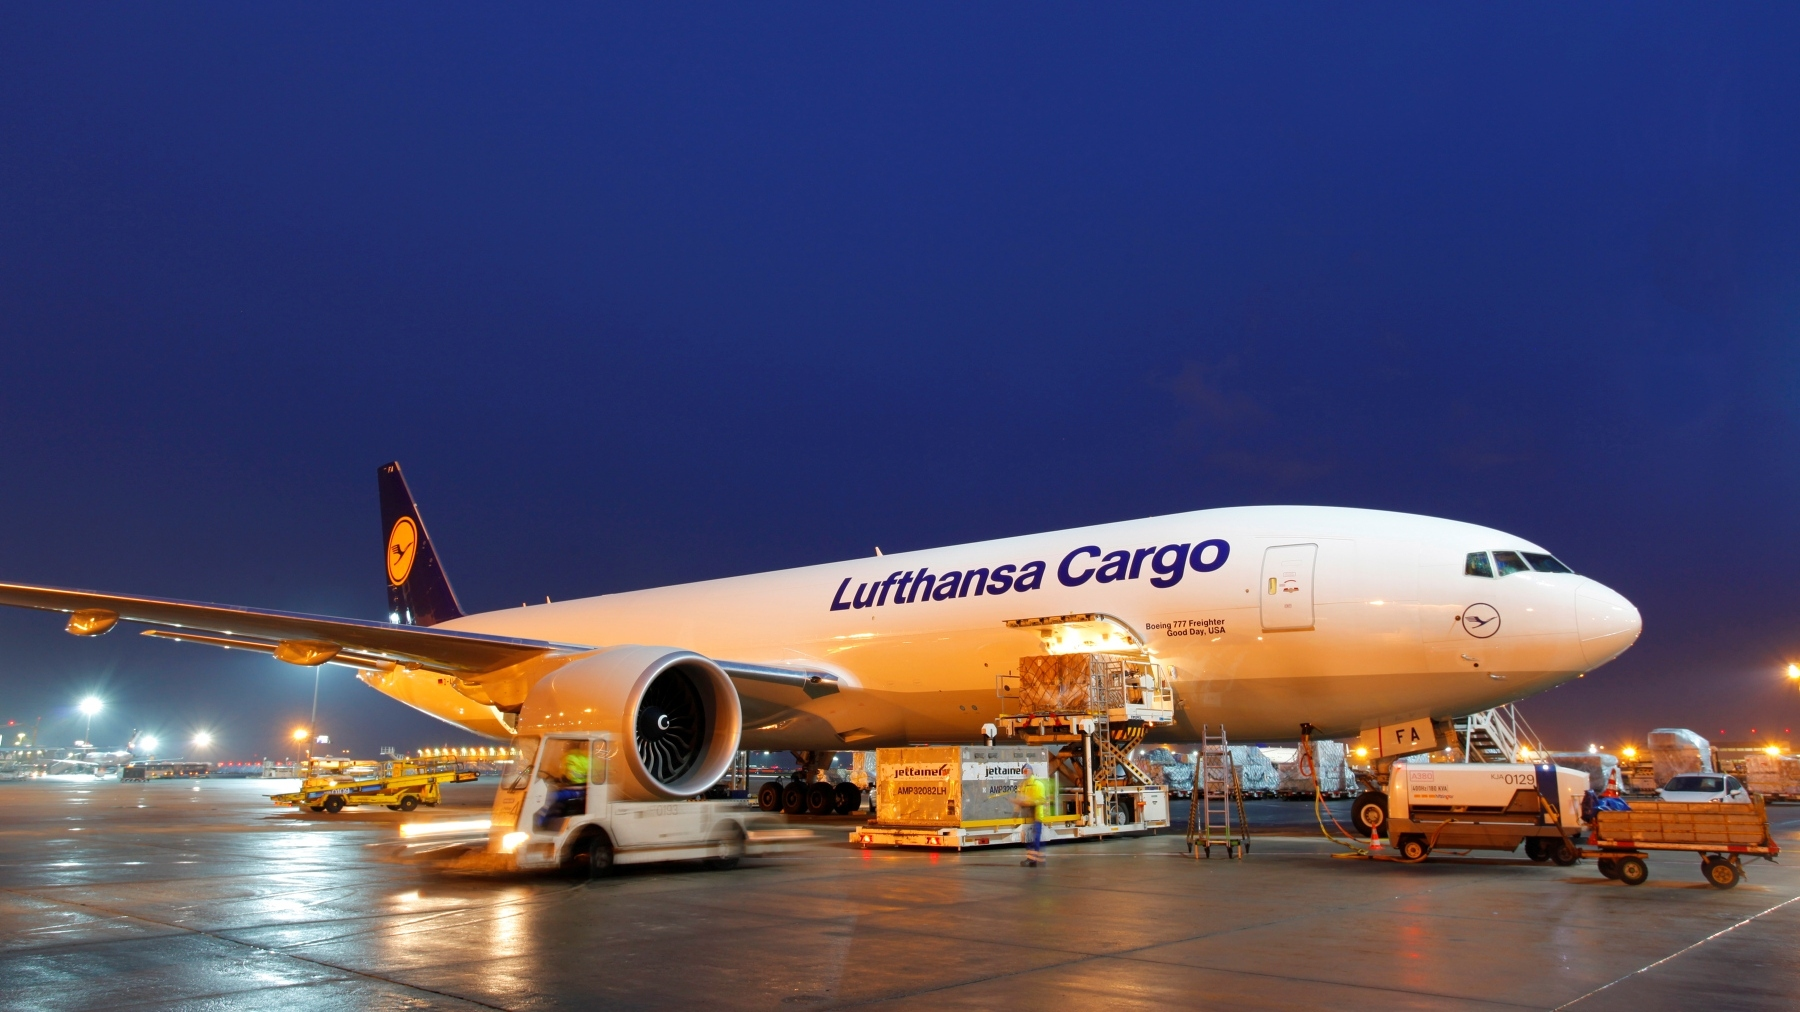 Air Freight Cargo Services | Agility |Cargo Air Freight